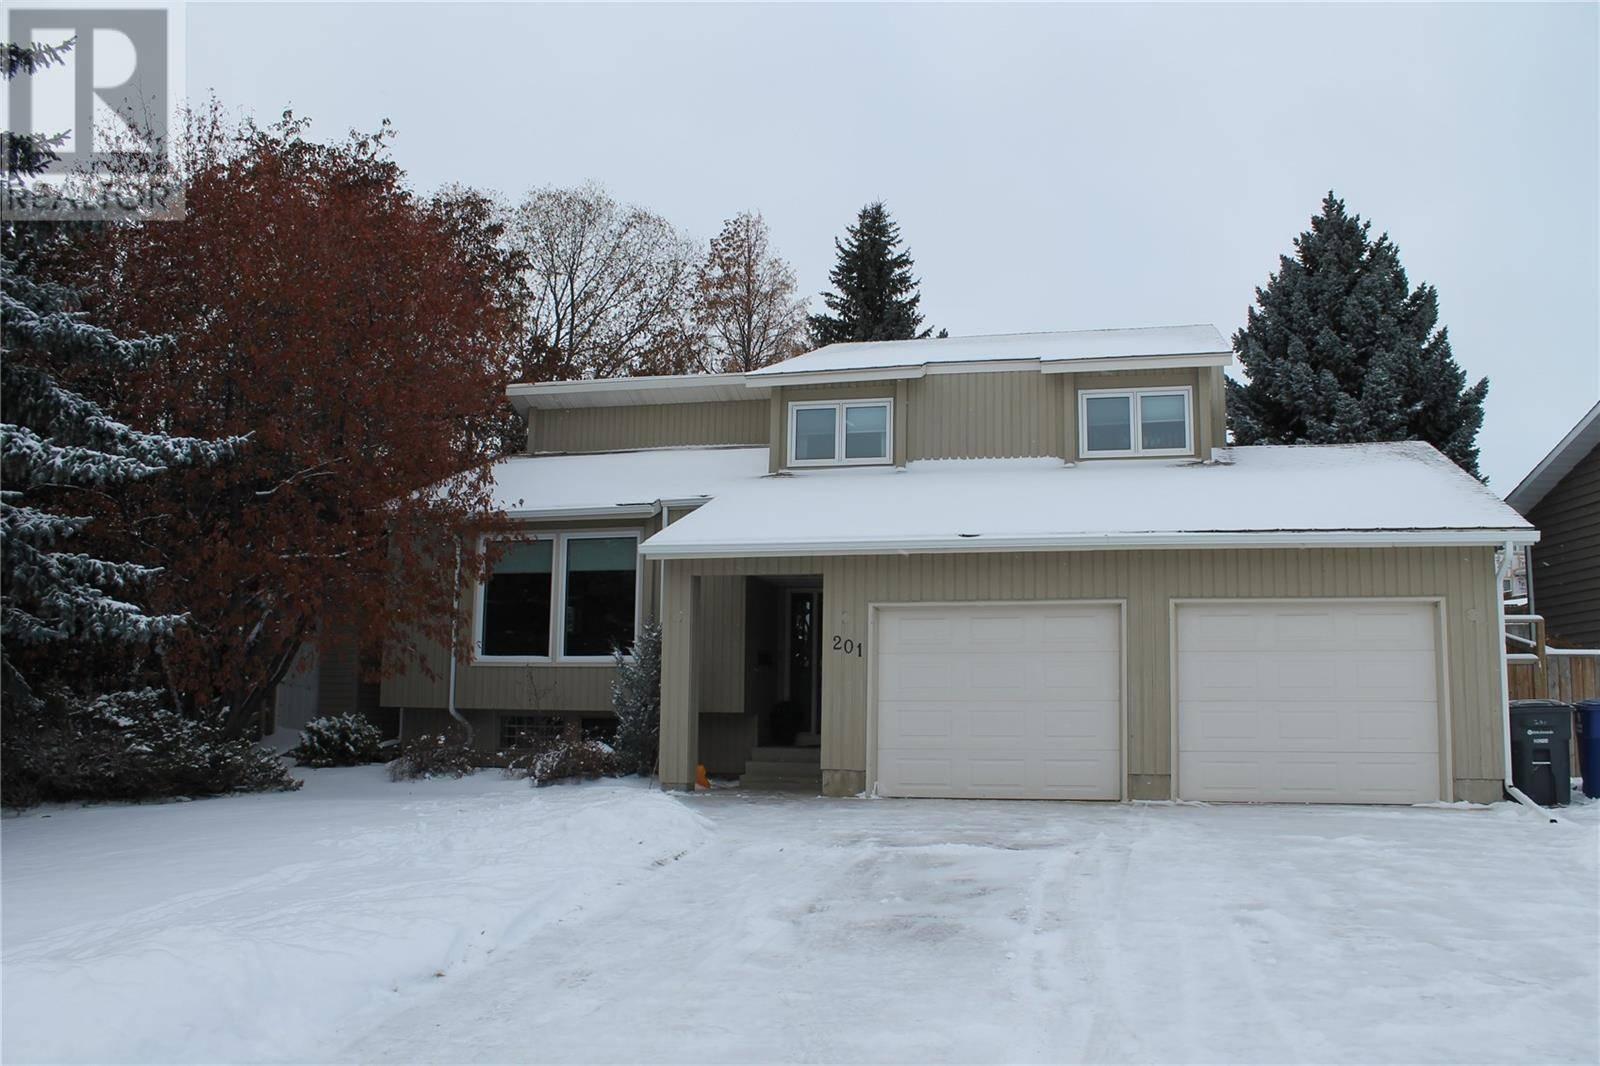 House for sale at 201 Sturgeon Pl Saskatoon Saskatchewan - MLS: SK789500